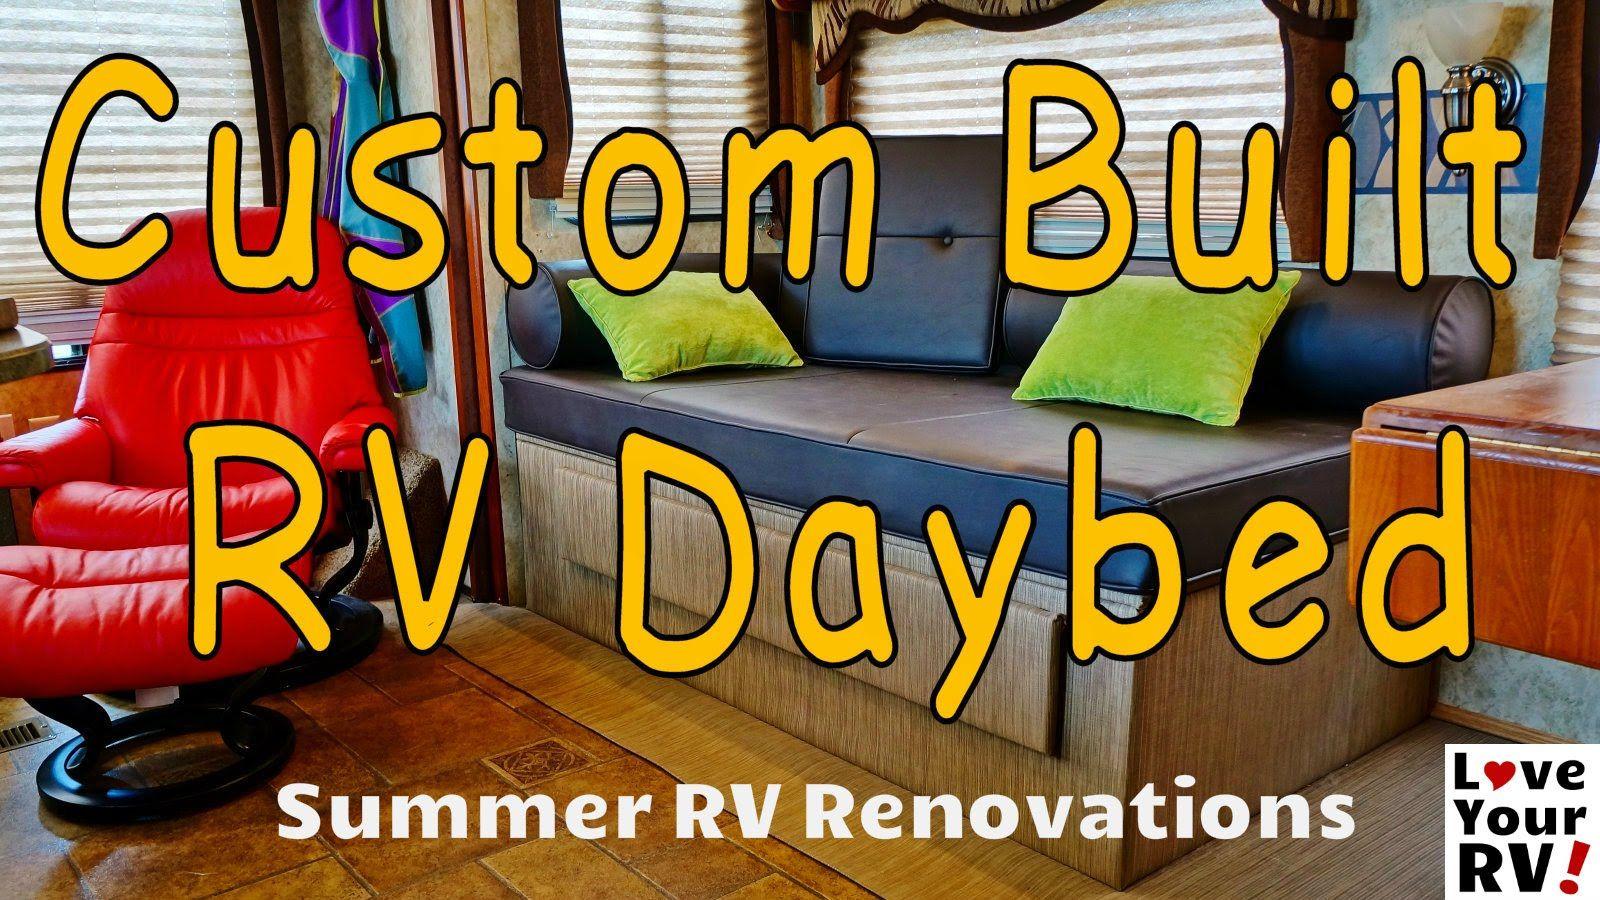 summer renovations part 6 custom rv daybed daybed rv interior